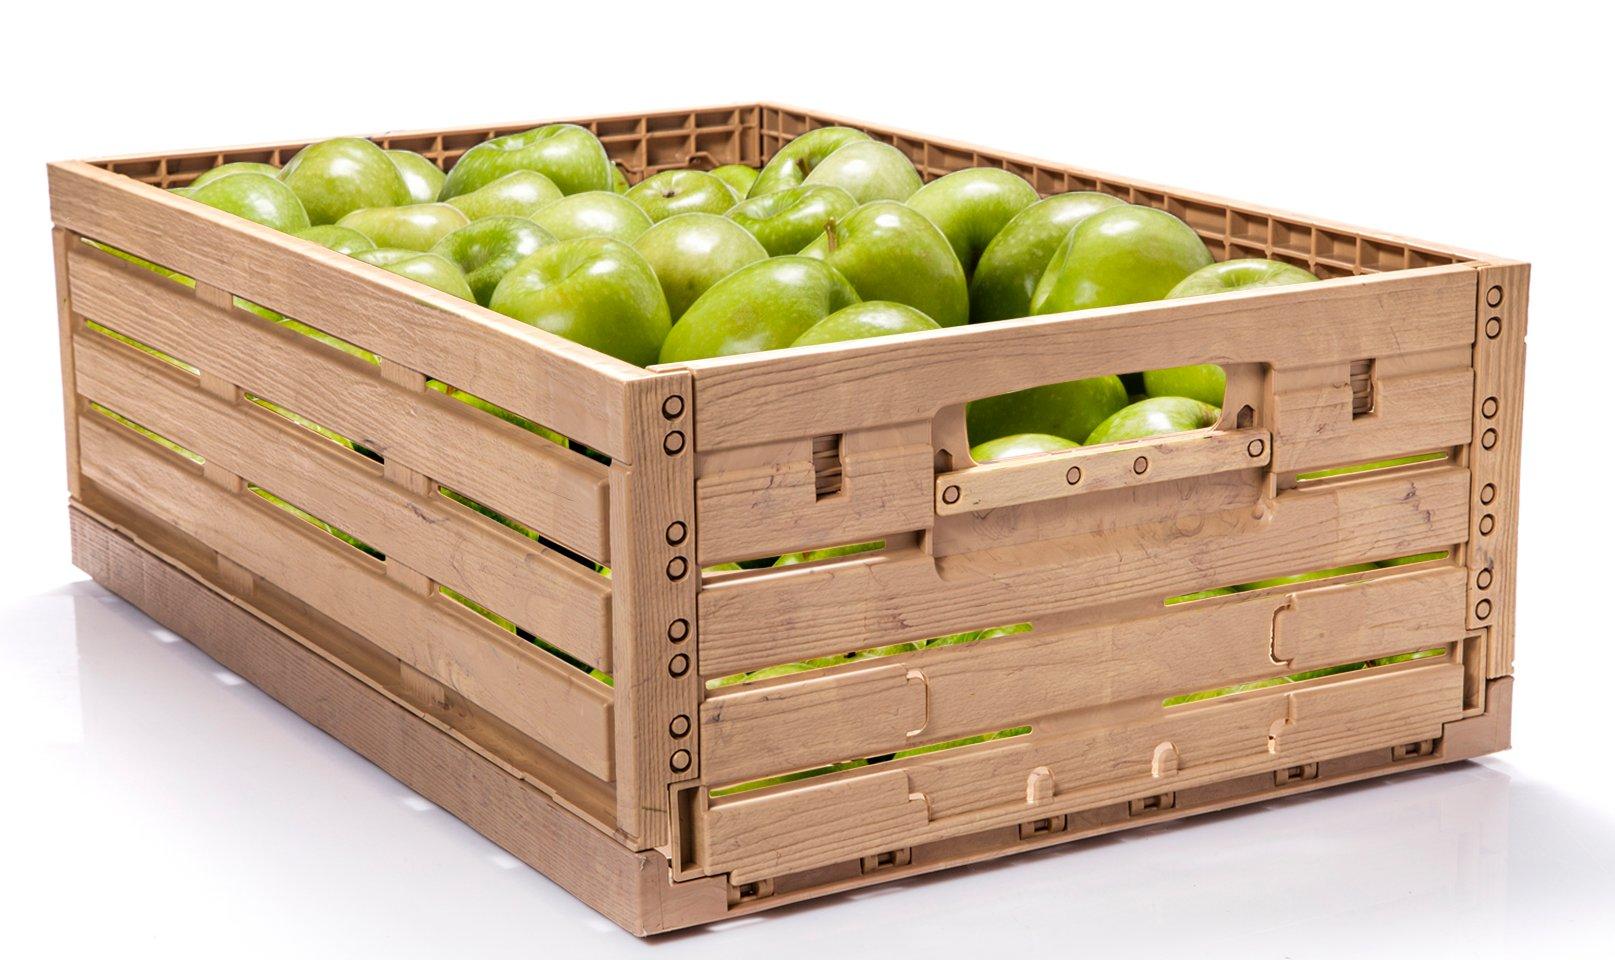 Obst- & Gemüsekisten